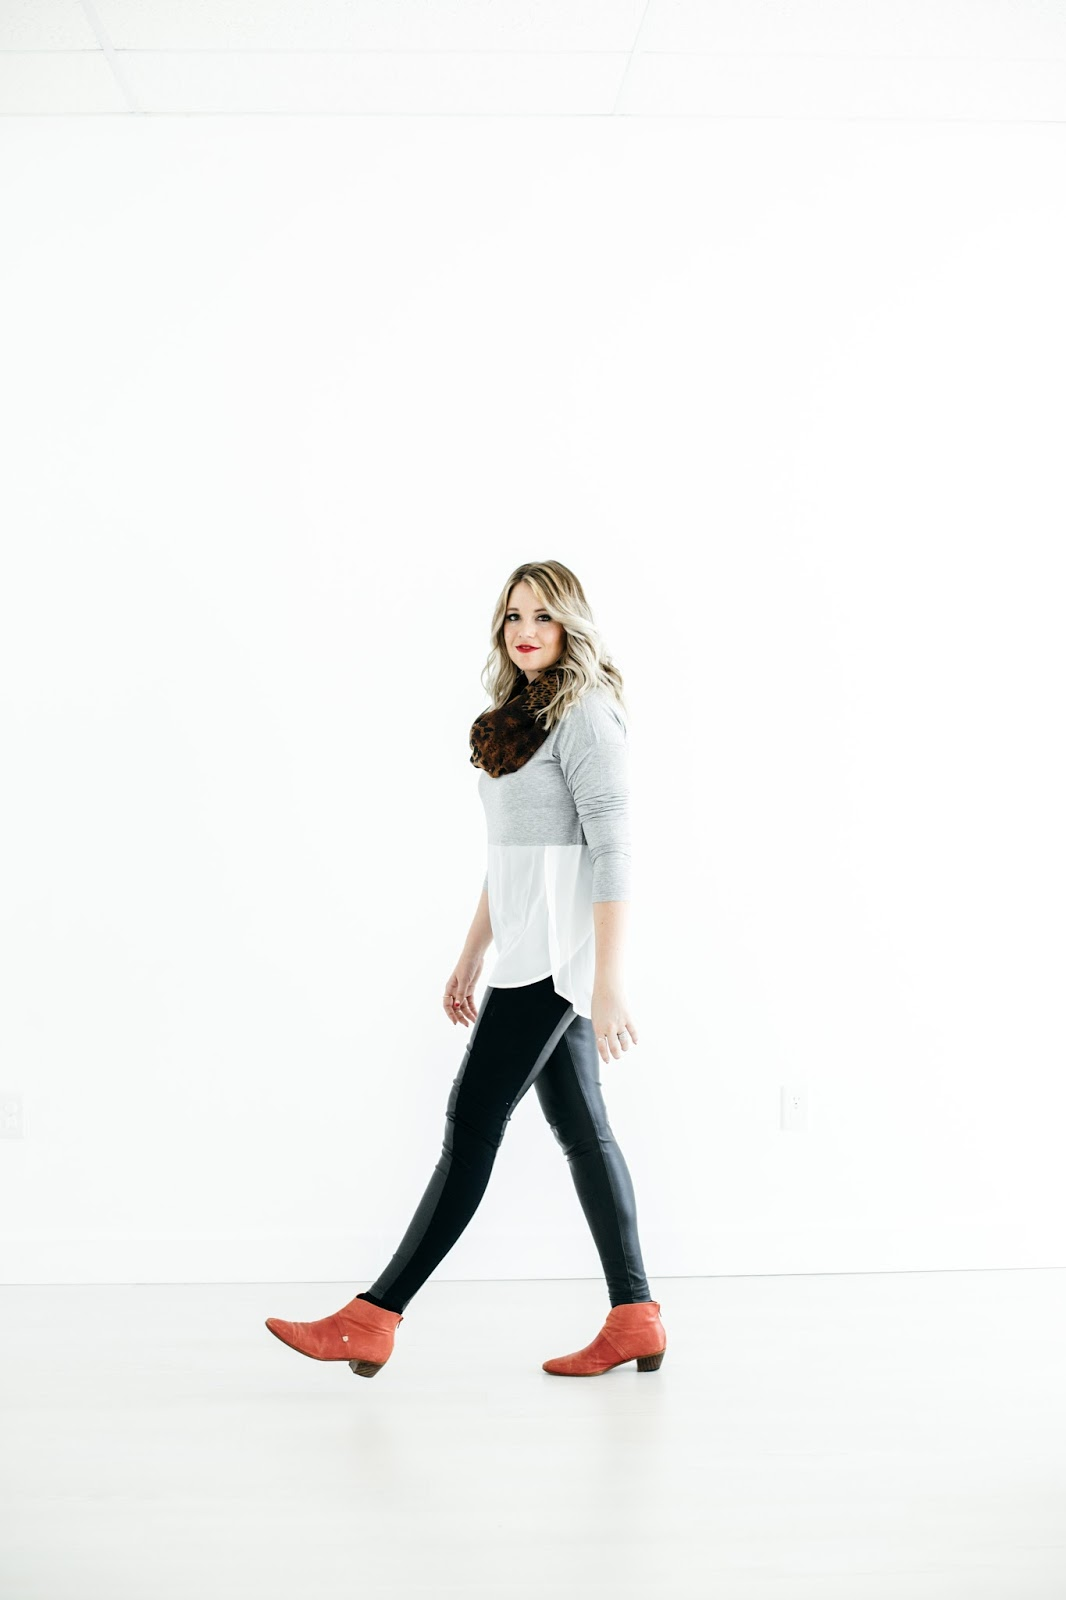 Bouvardian, Leopard Scarf, Utah Fashion Blogger